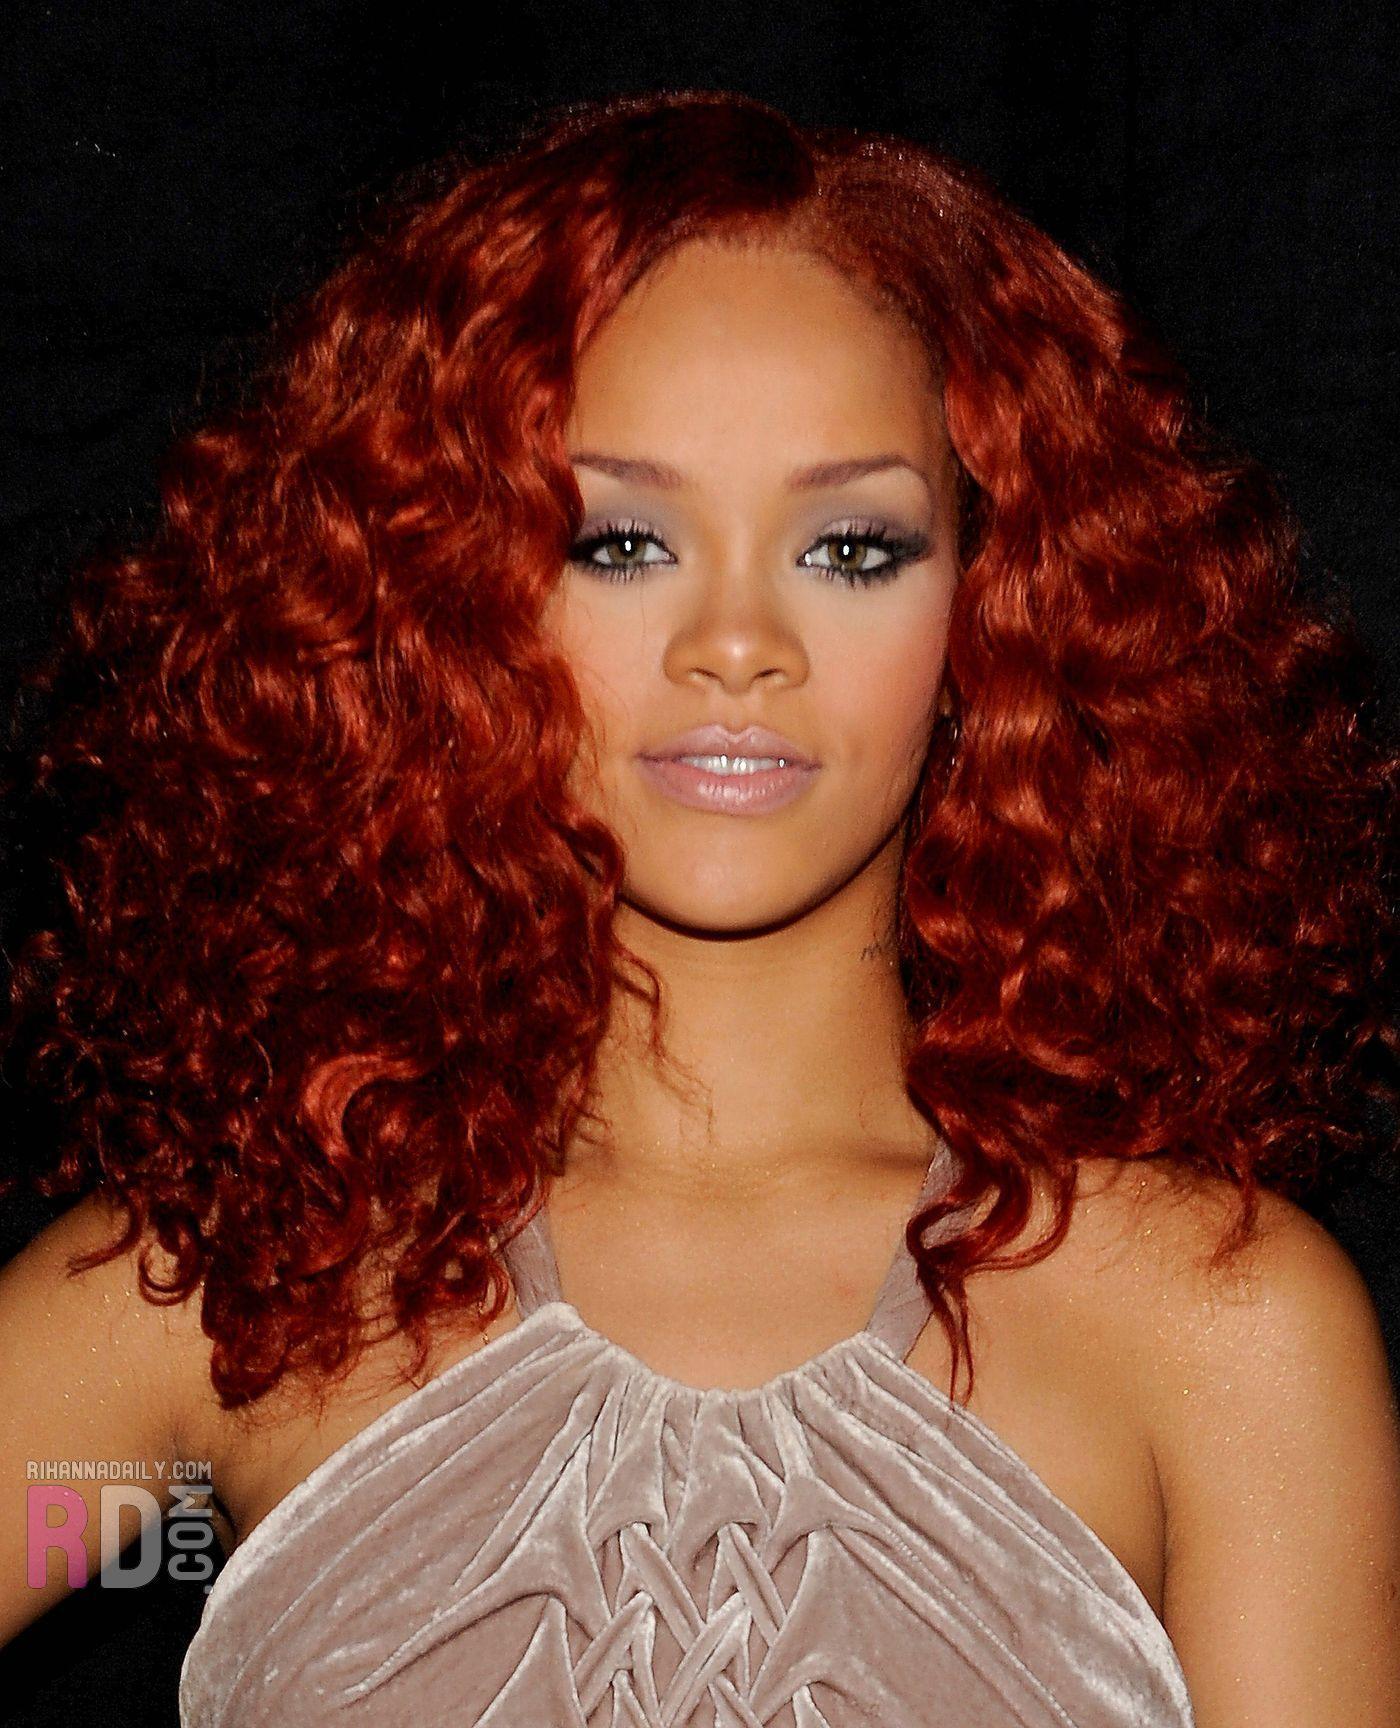 Rihanna American Idol April 14 2011 Rihanna Photo